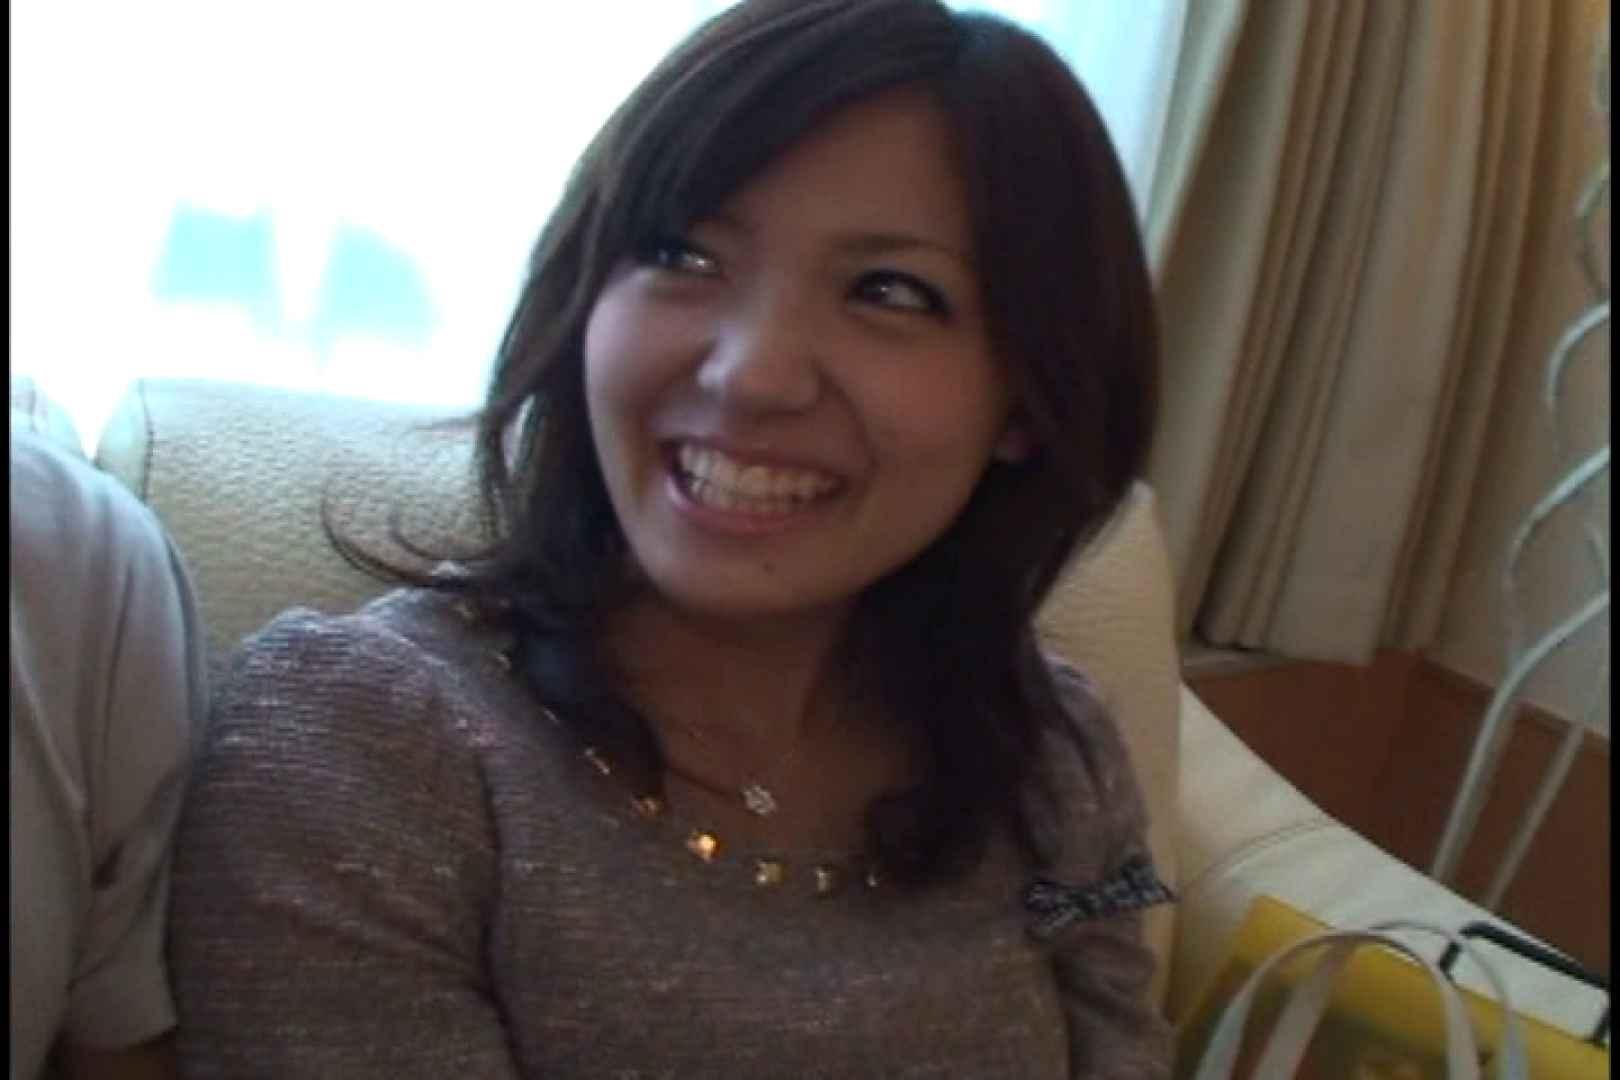 JDハンター全国ツアー vol.035 前編 女子大生のエロ動画  110PIX 50